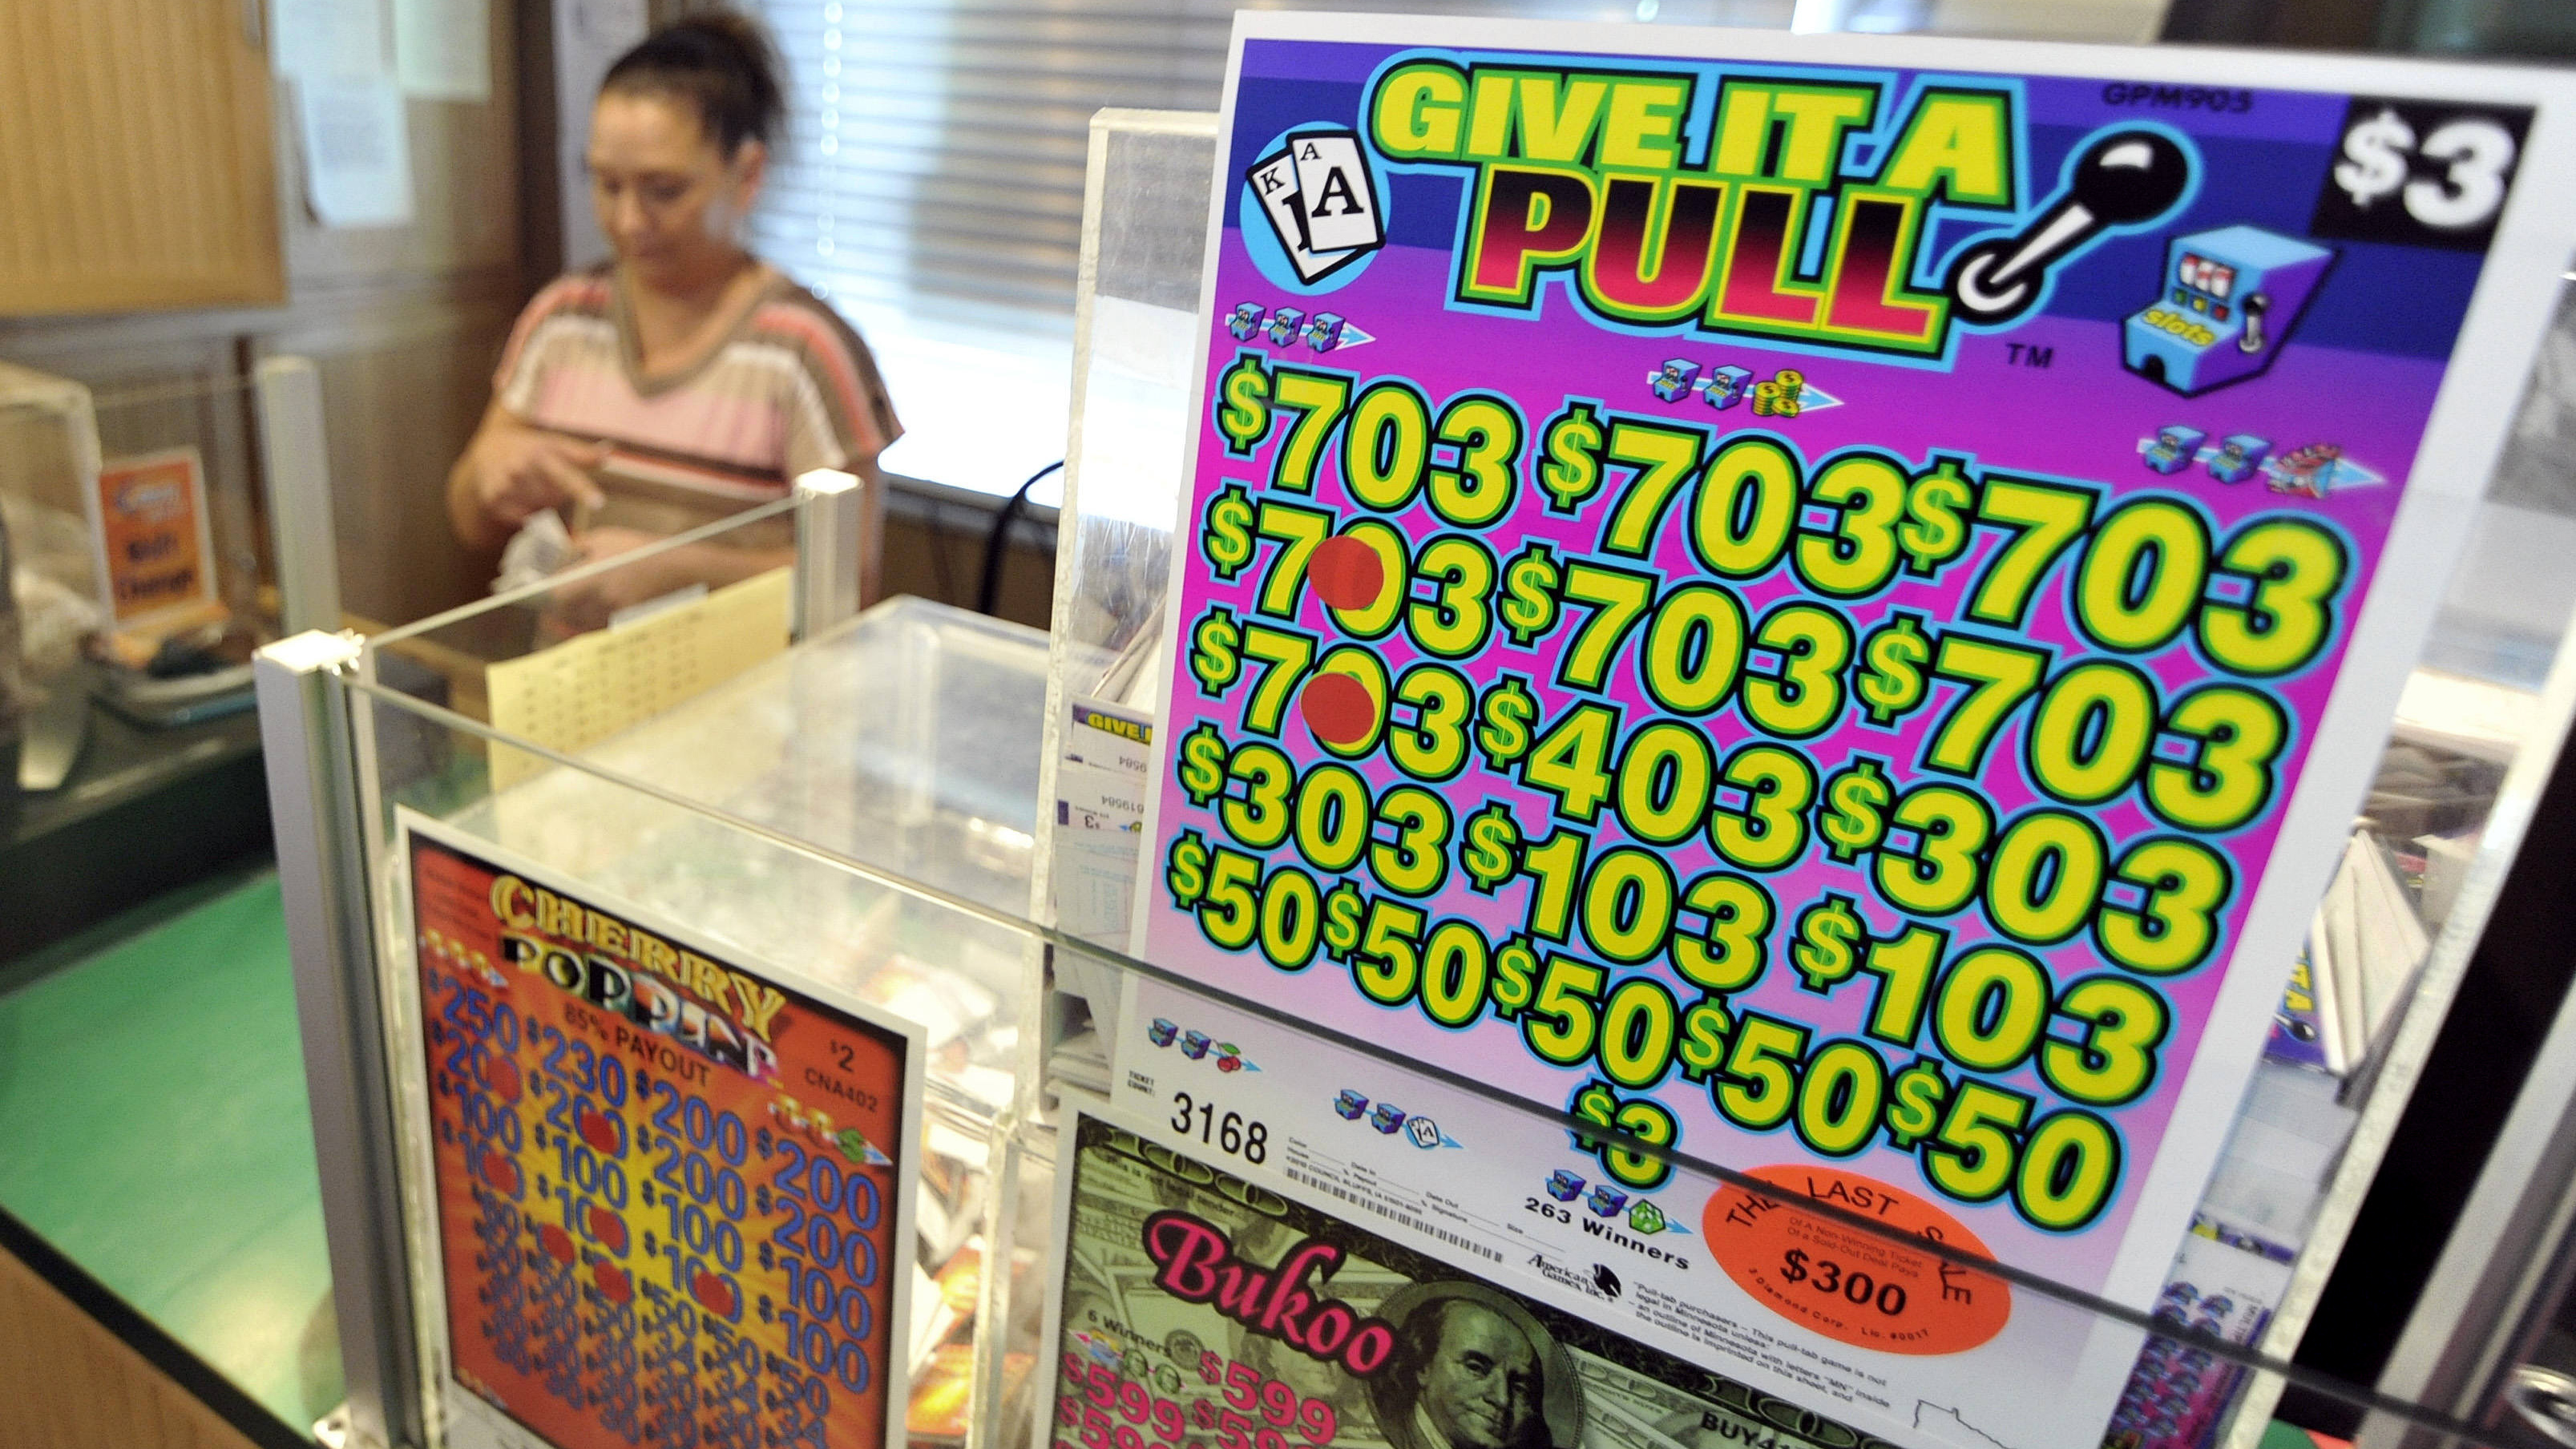 Npr gambling addiction river rock casino richmond b.c